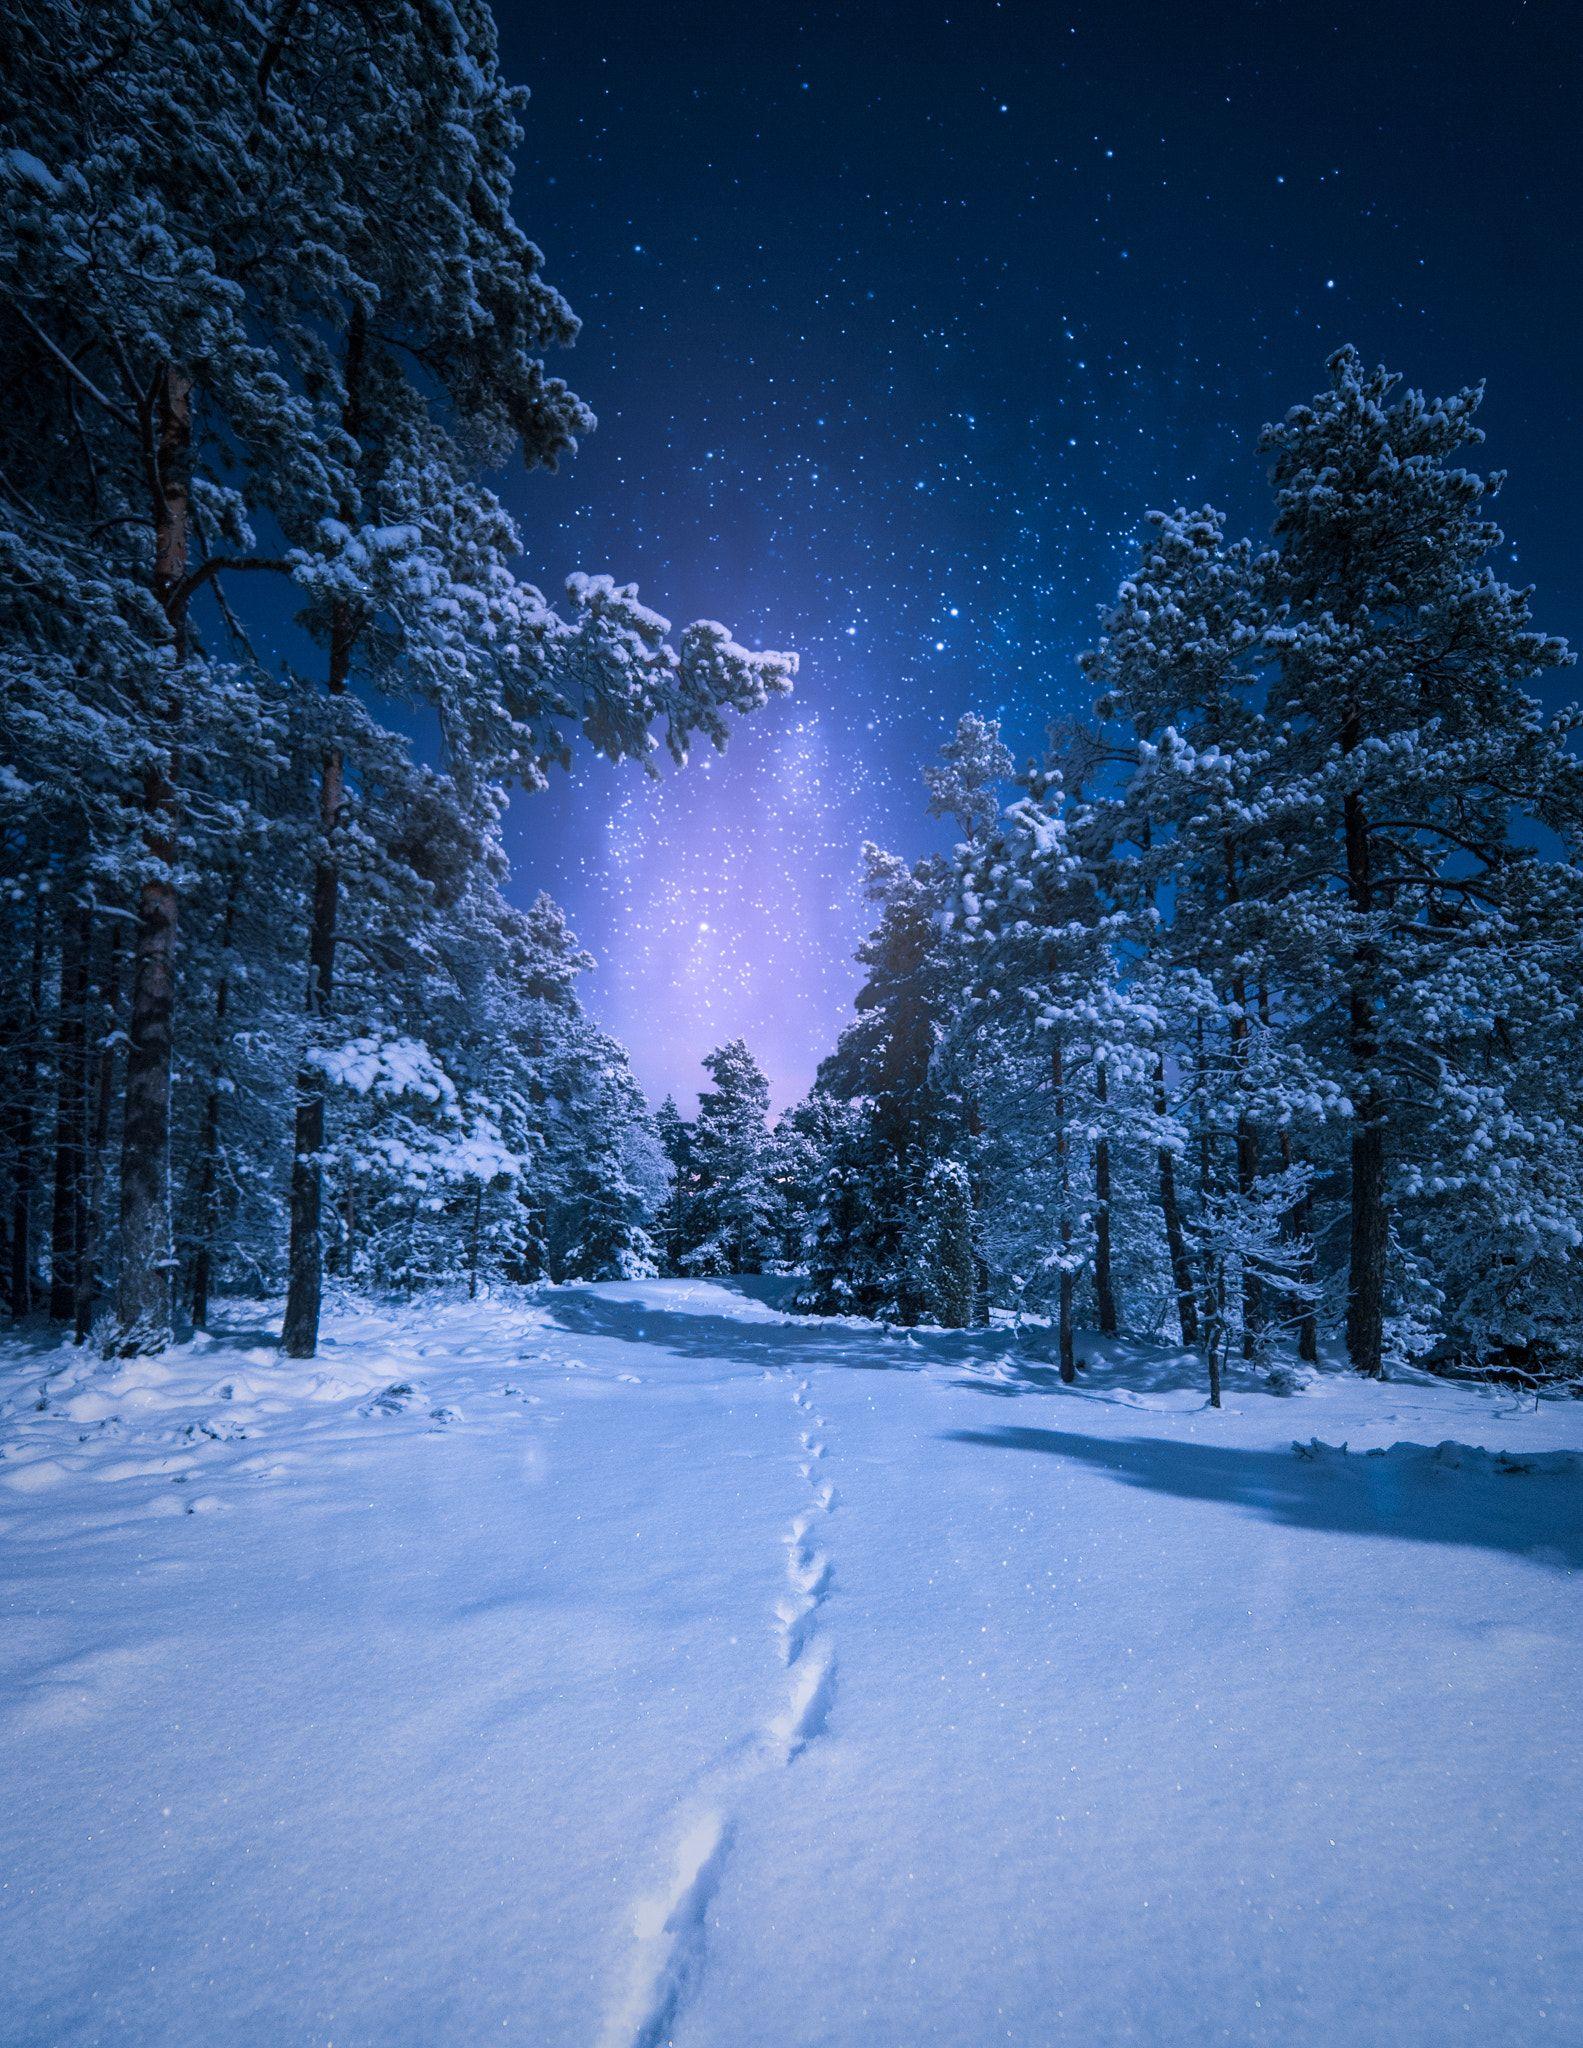 Trail In The Snow Beautiful Nature Scenes Snow Scenes Photography Winter Scenes